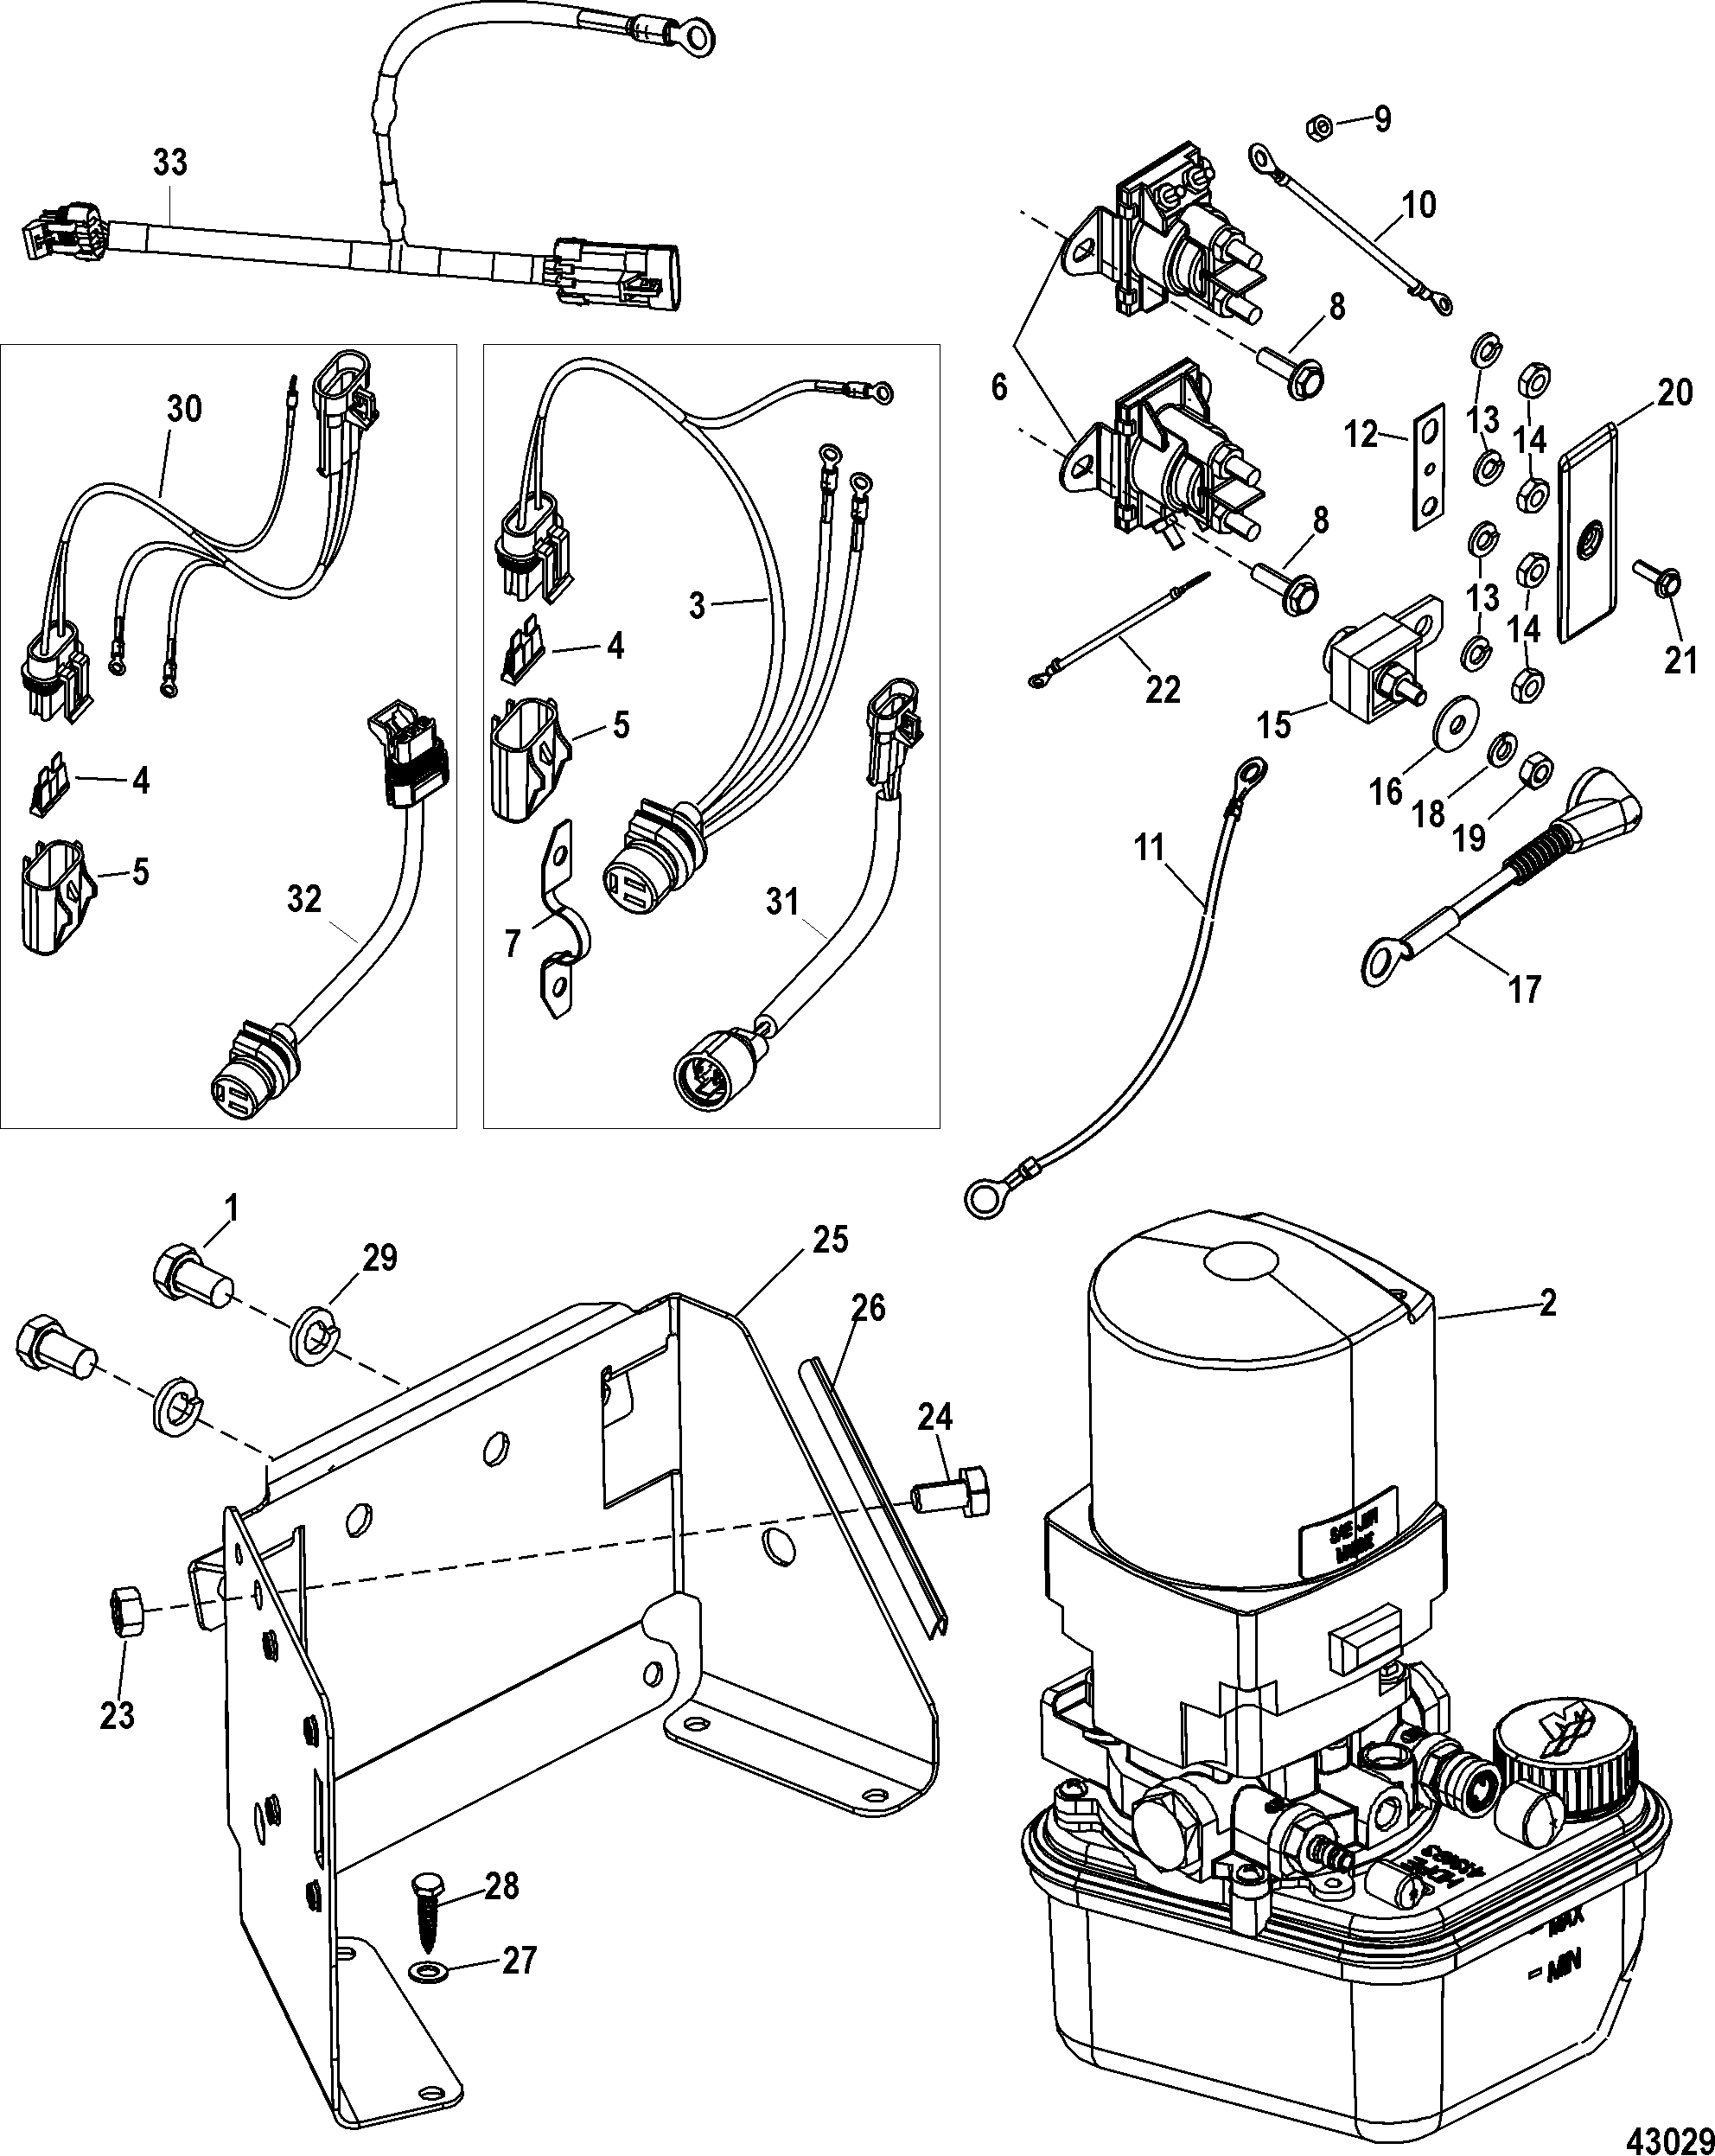 Mercury Trim Pump Diagram Manual Guide Wiring Mercruiser Tilt Integrated Transom 0m052768 Up Rh Vansoutboardparts Com Parts